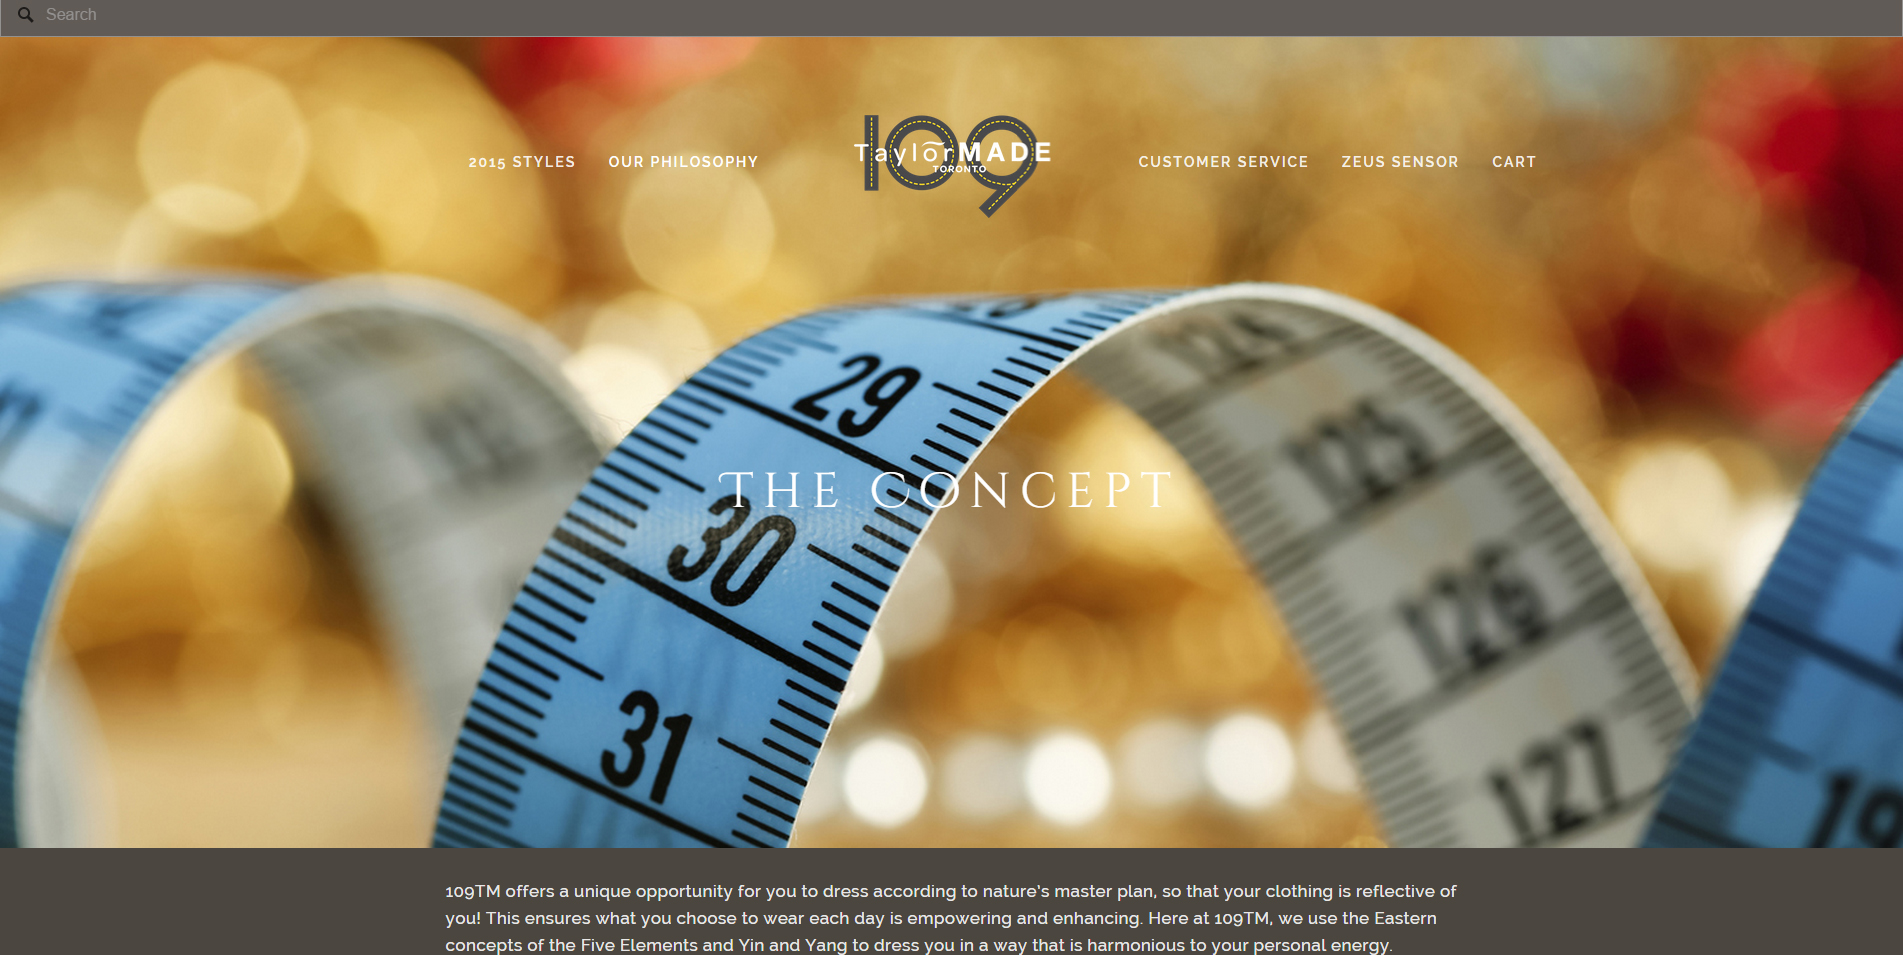 109taylormade.com